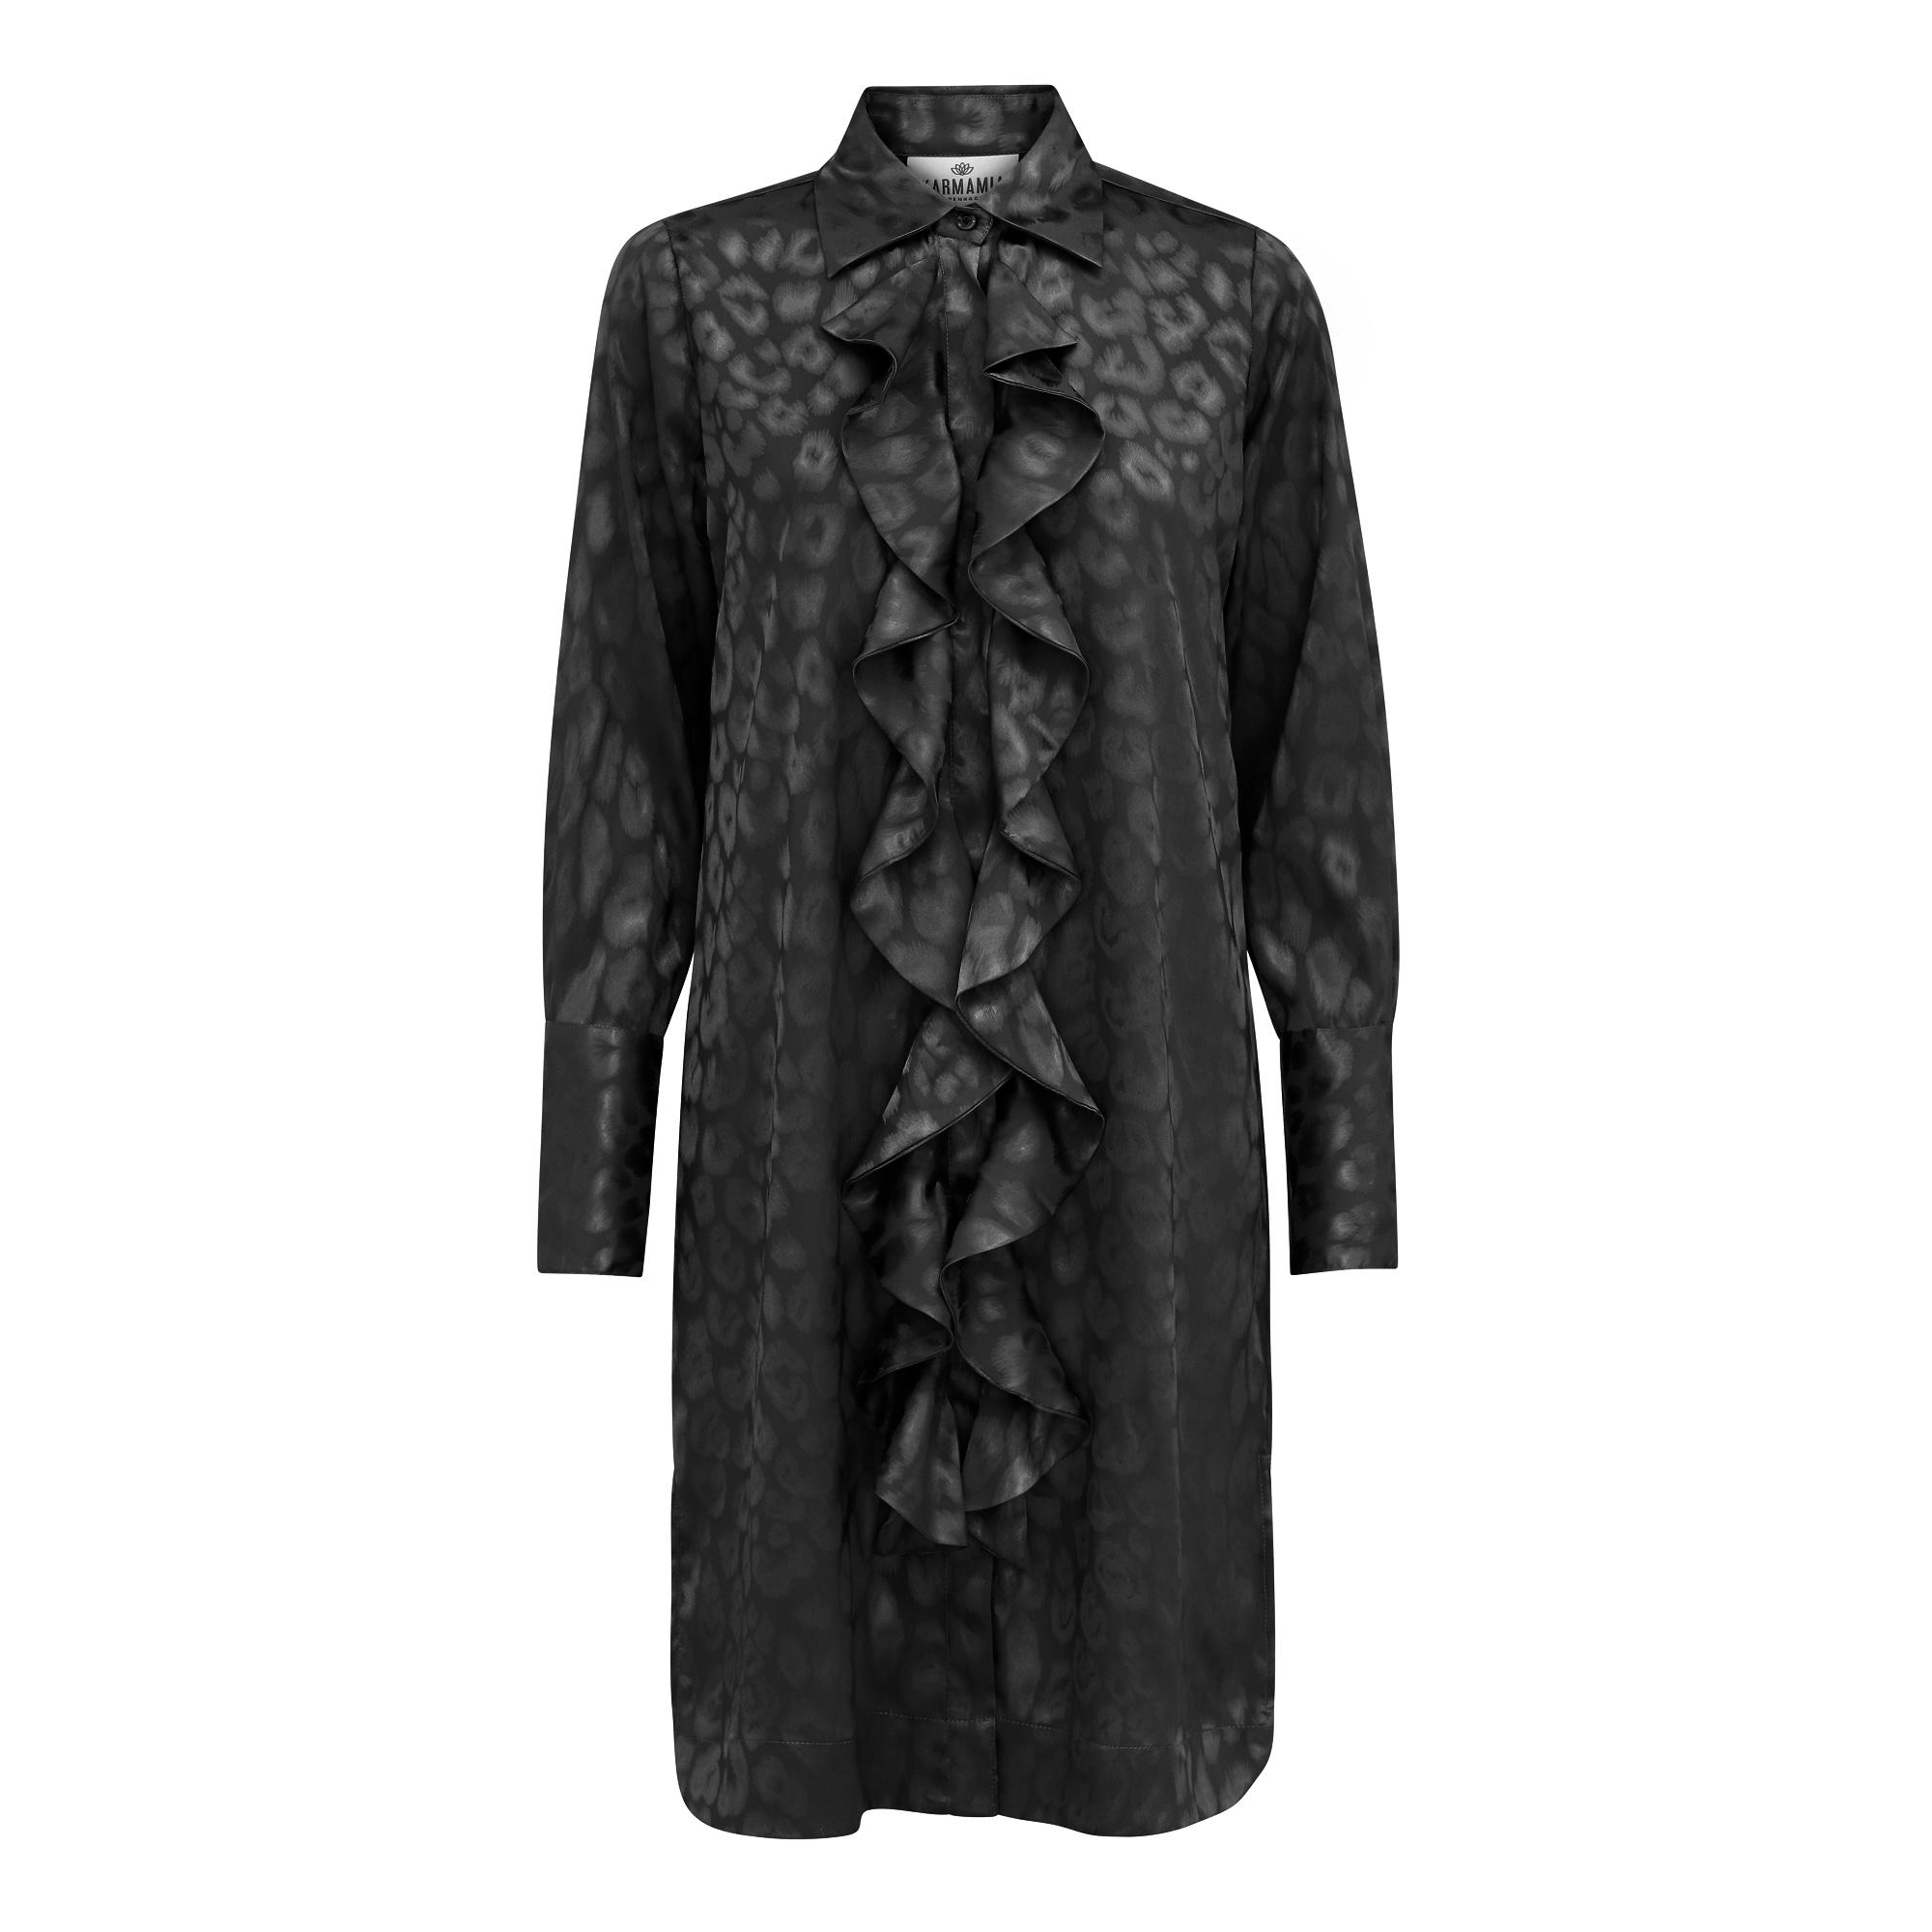 KARMAMIA Ruffle Kimono (short) - Black Leo Jacquard IMAGE BY ME